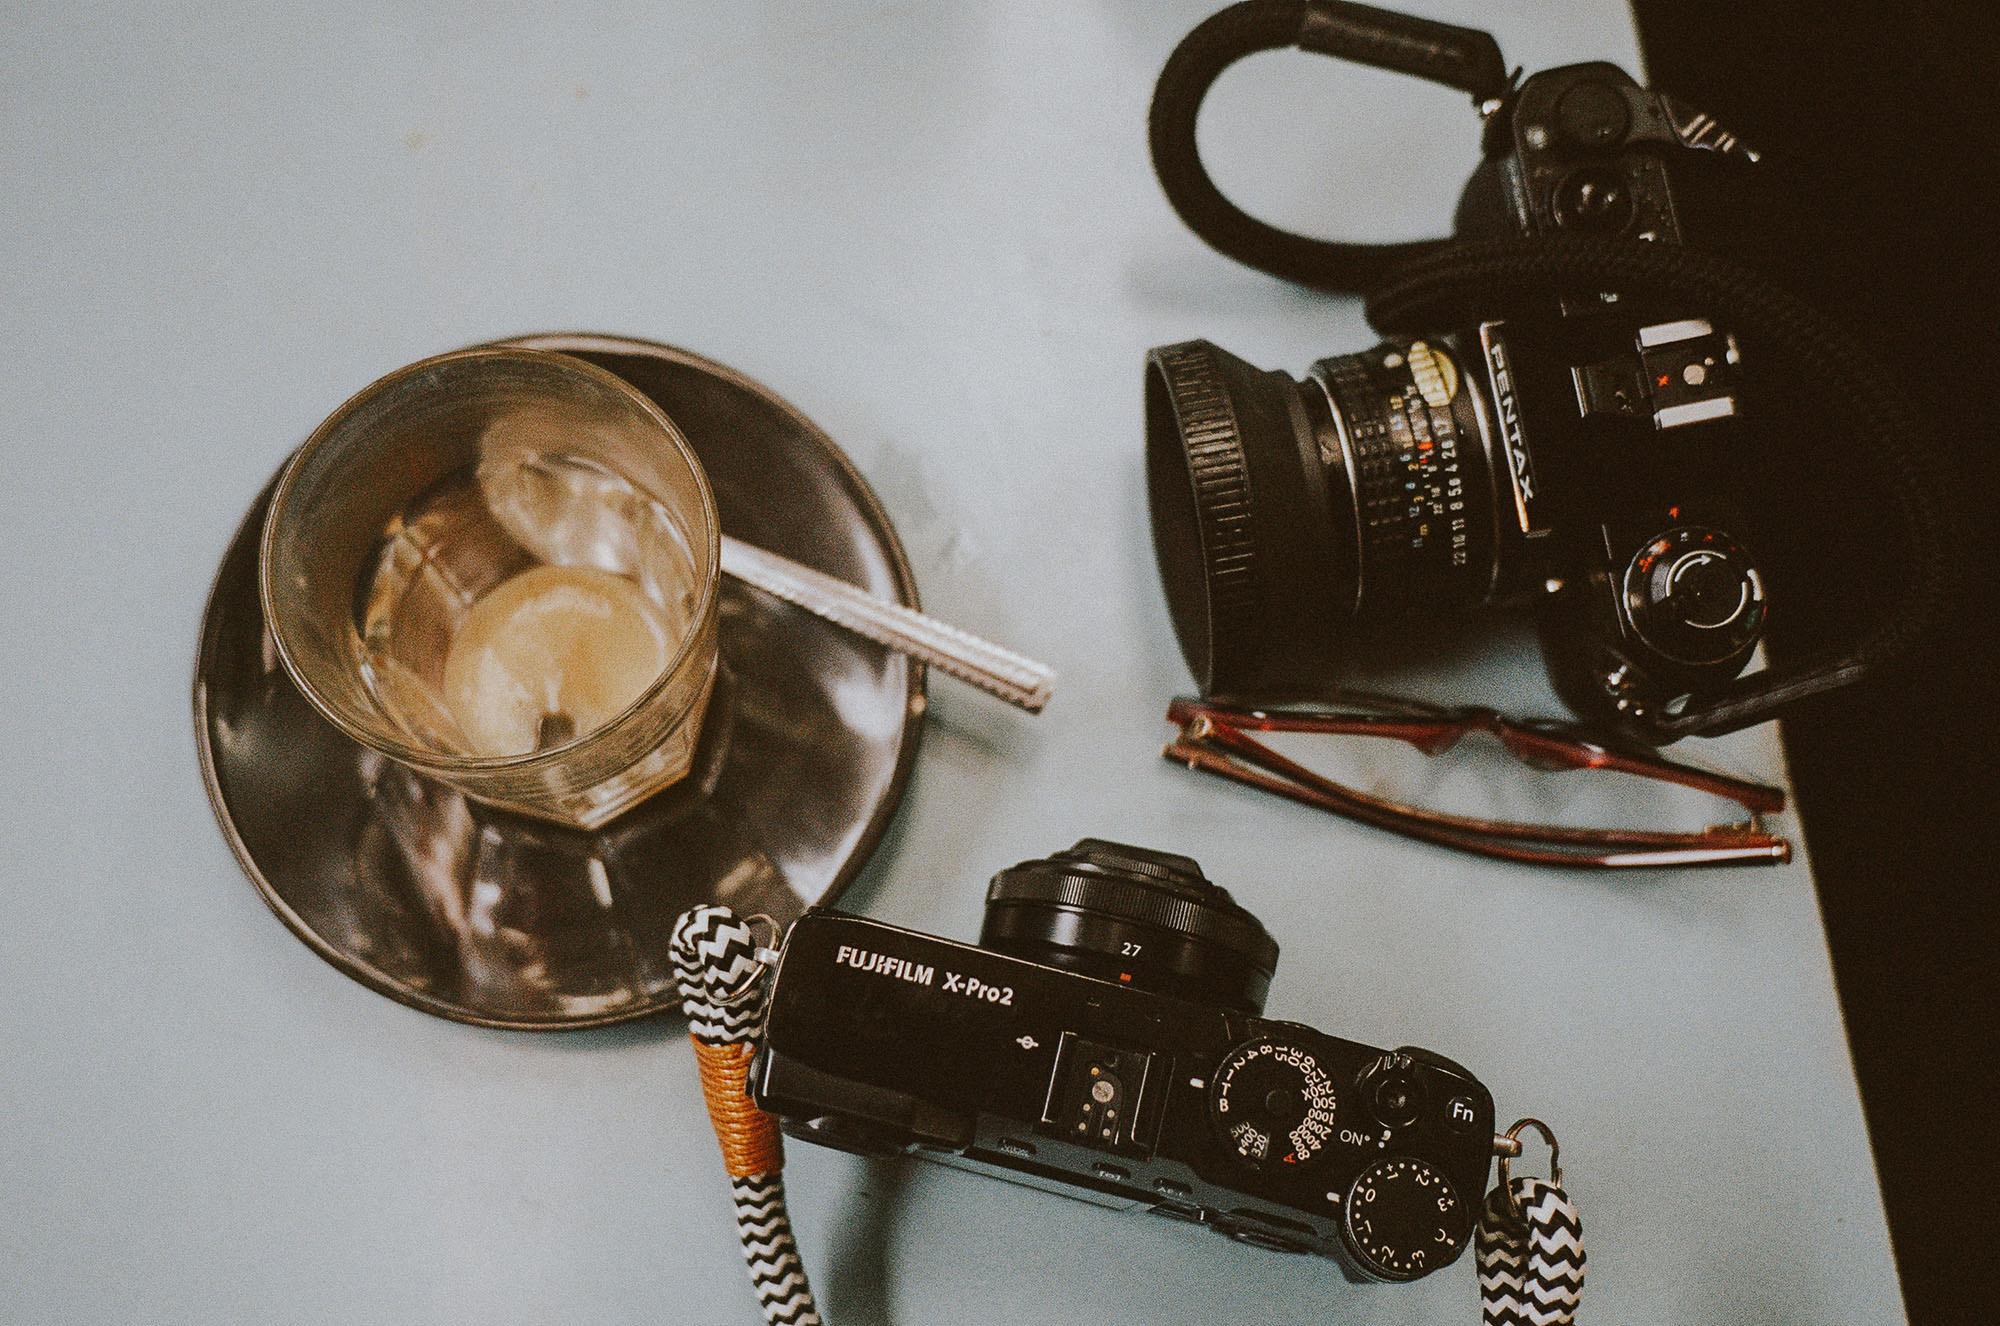 Analogue photography Brighton hove